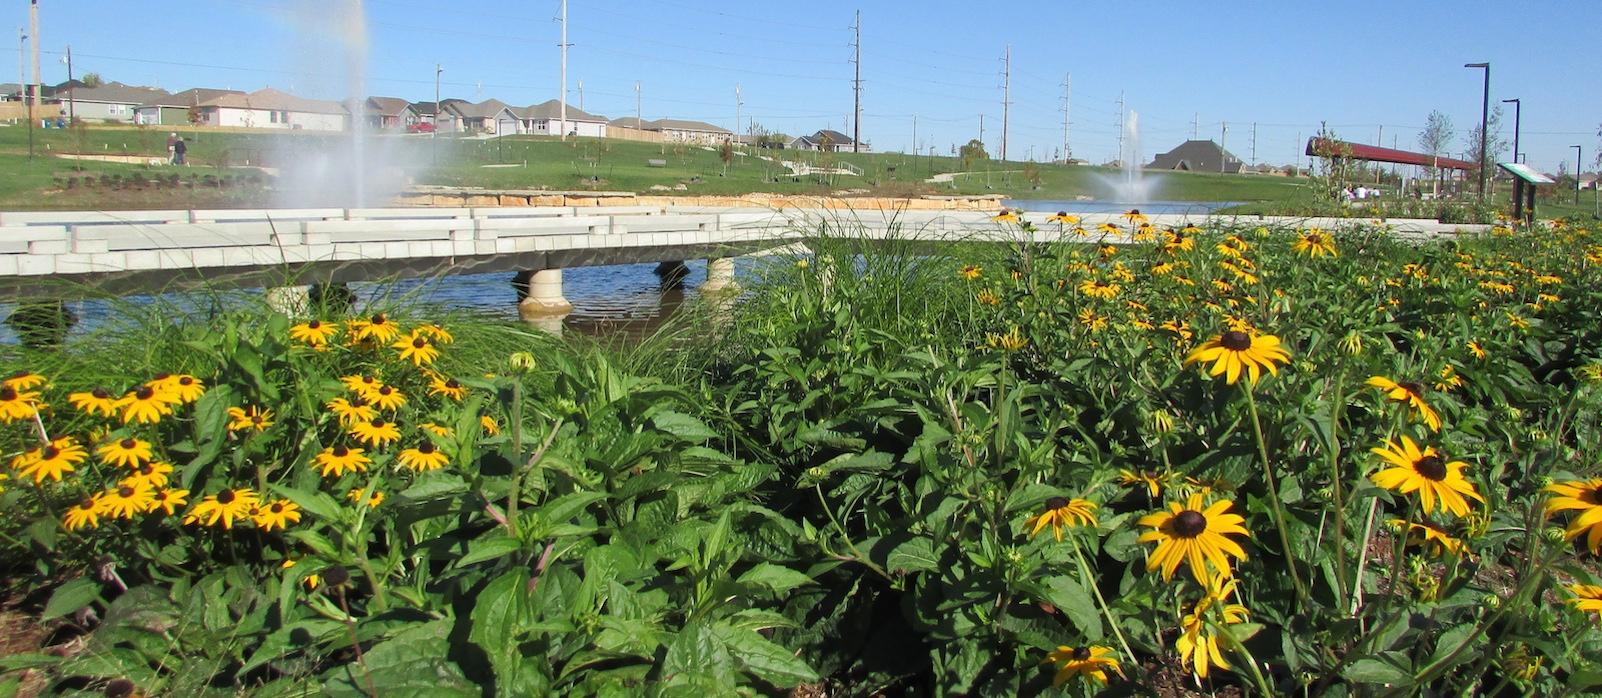 mercy park joplin observation deck flowers.jpg